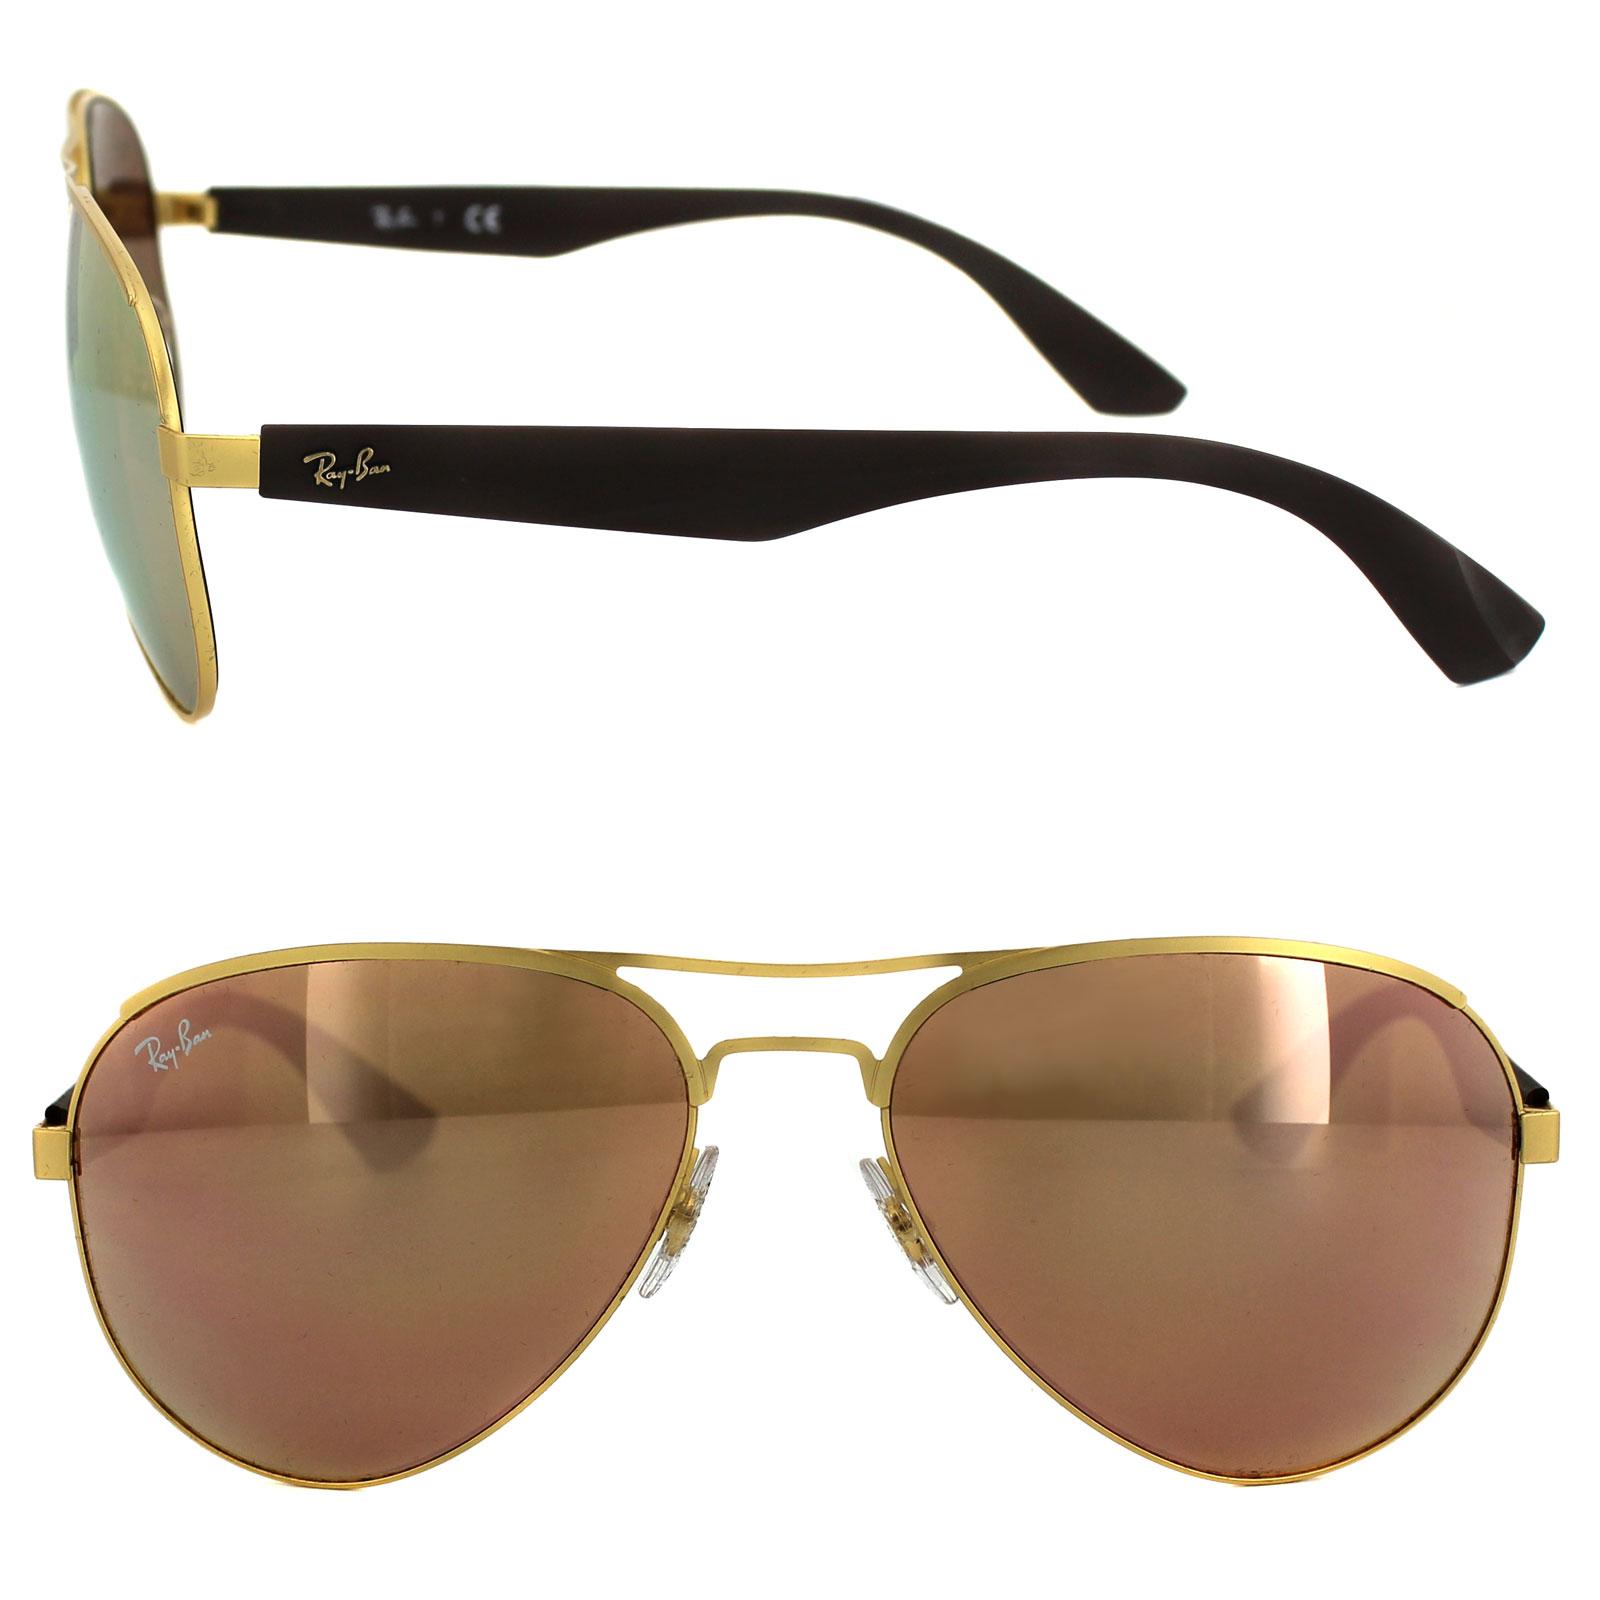 86fd47d423 Ray-Ban Sunglasses 3523 112 2Y Gold Copper Mirror 8053672508130